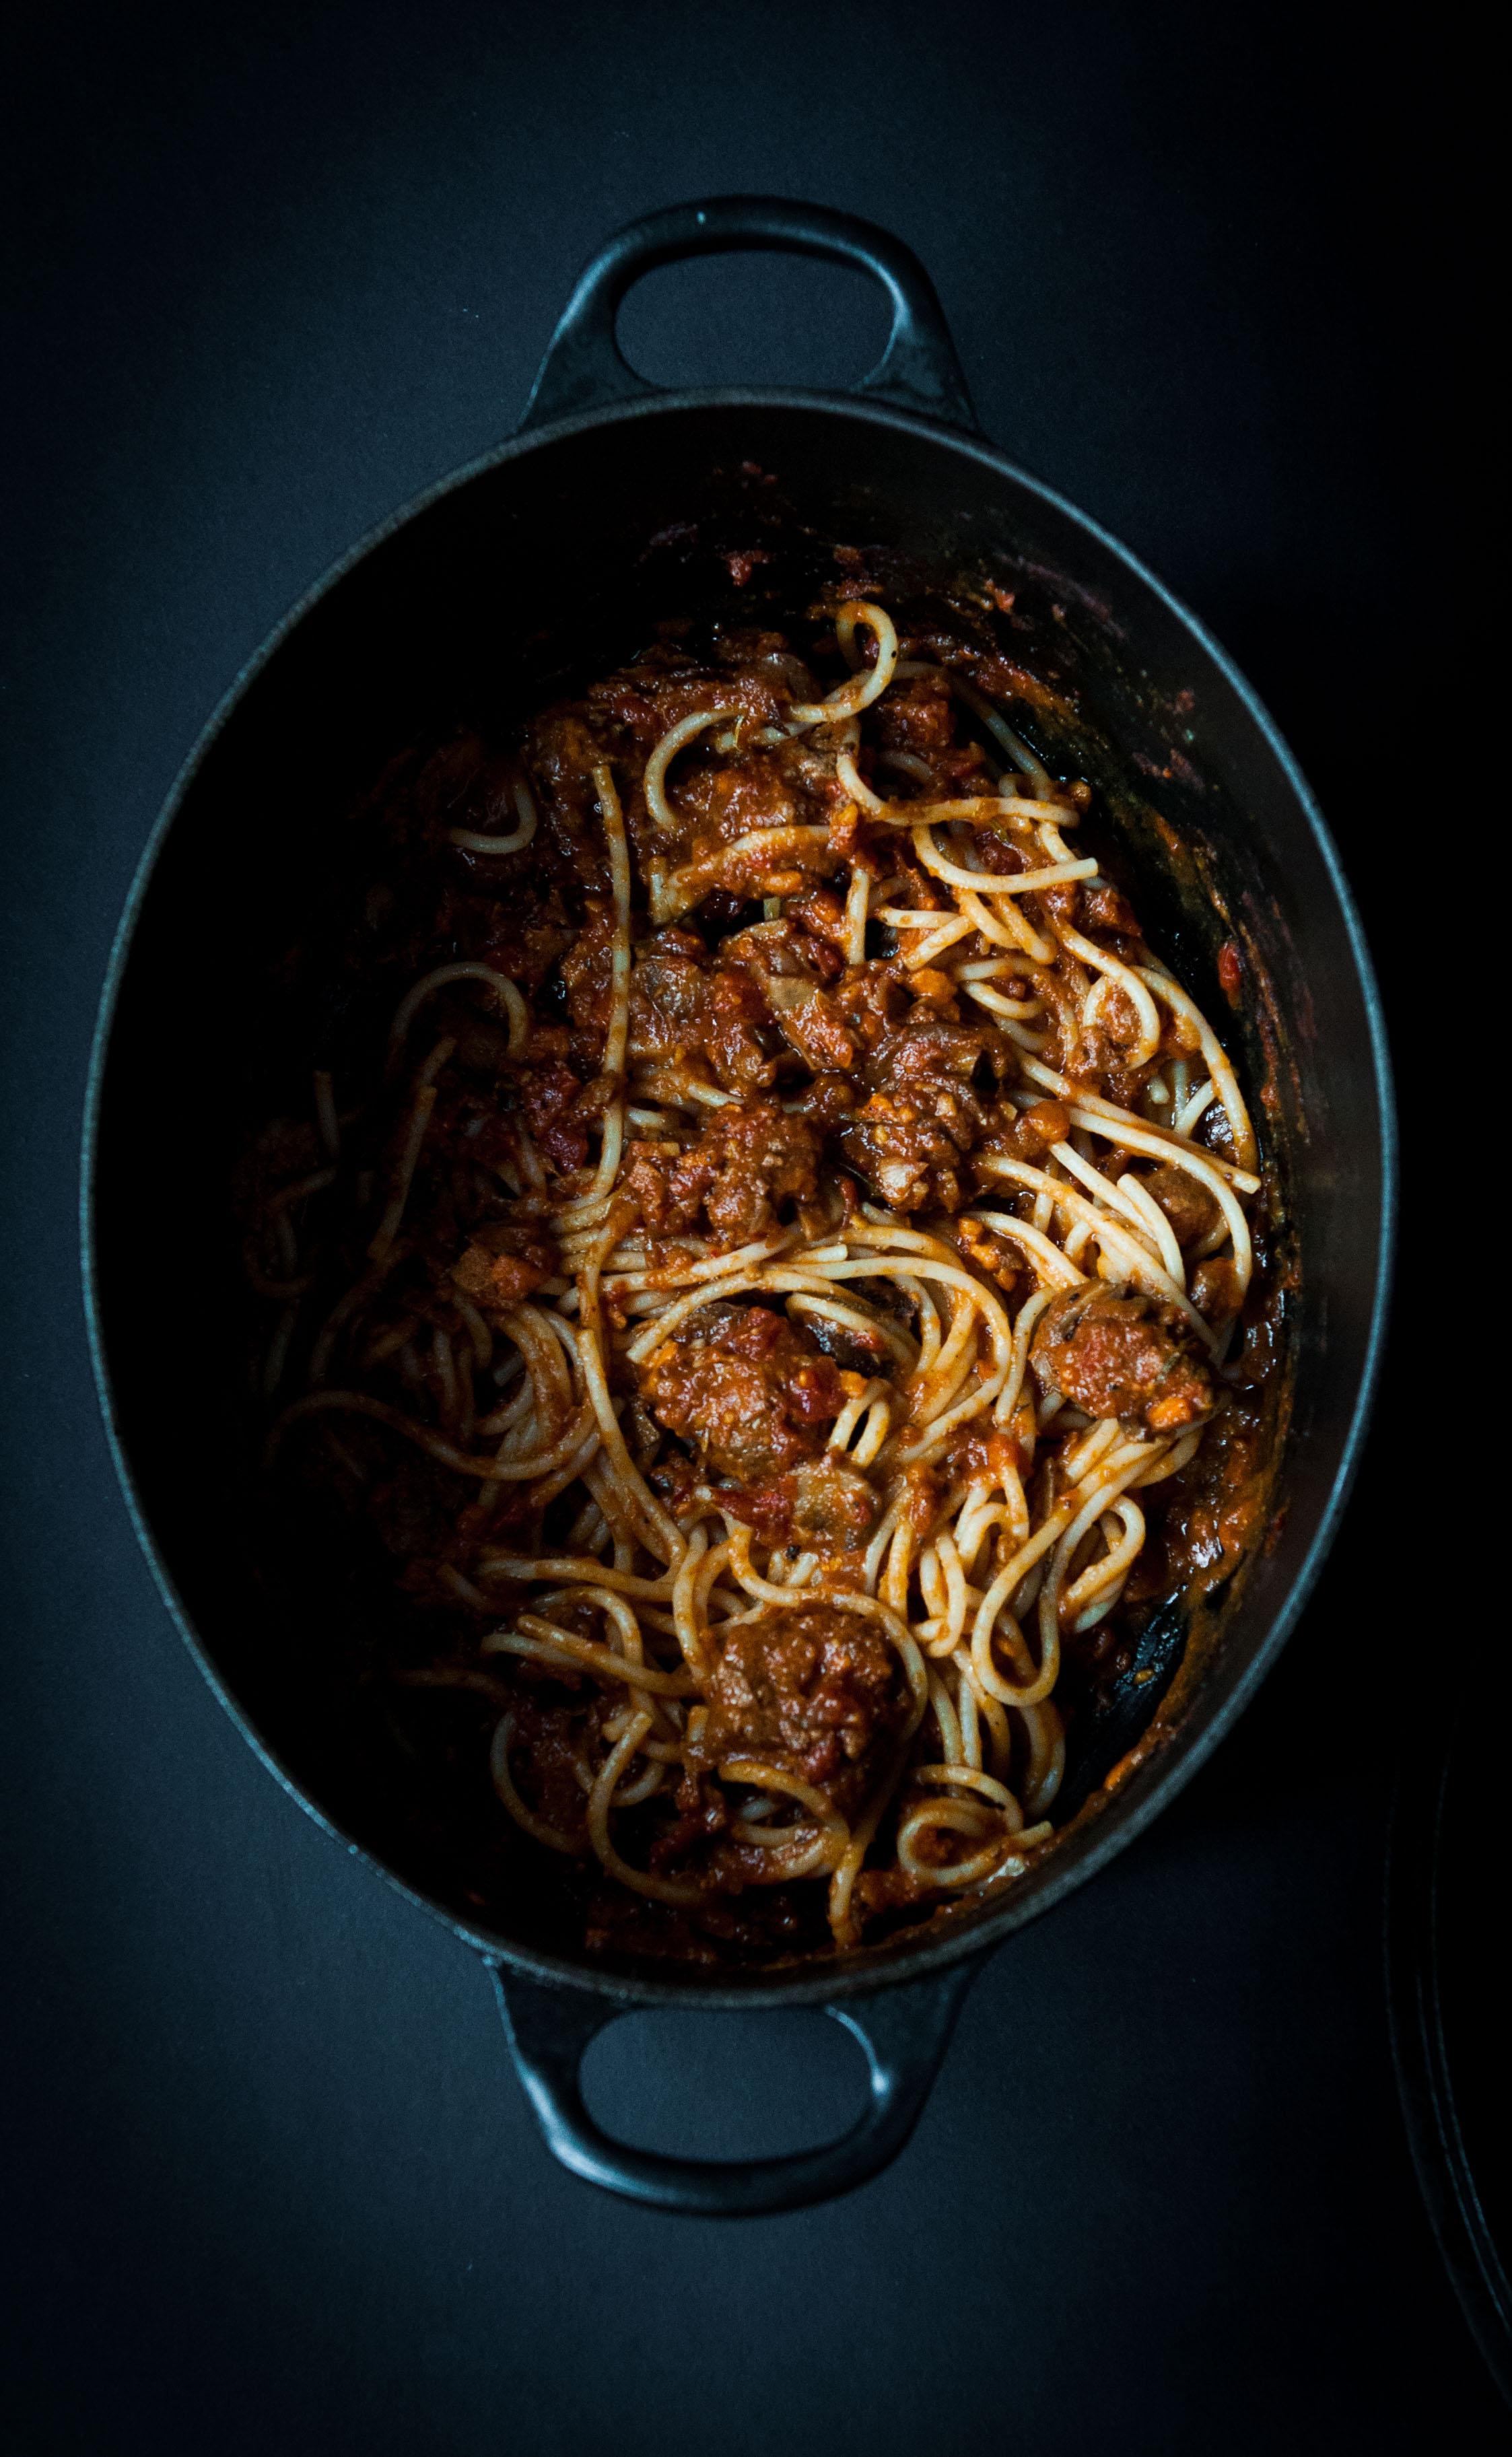 Portly italian drains those meatballs